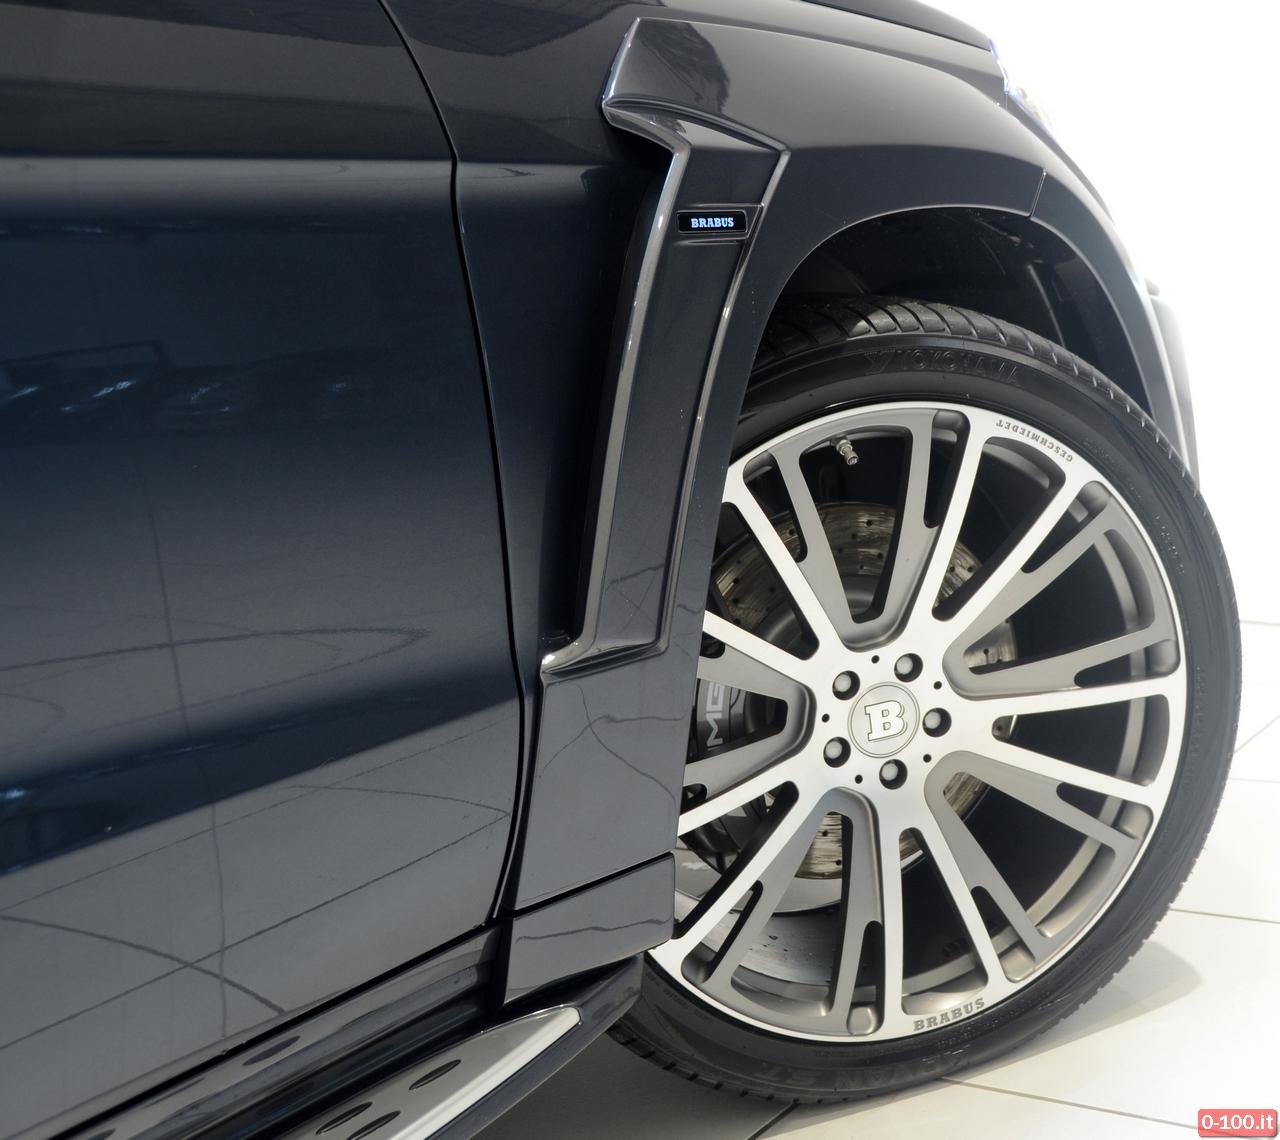 brabus_B63S_700_widestar_Mercedes_GL63-AMG_0-100_7